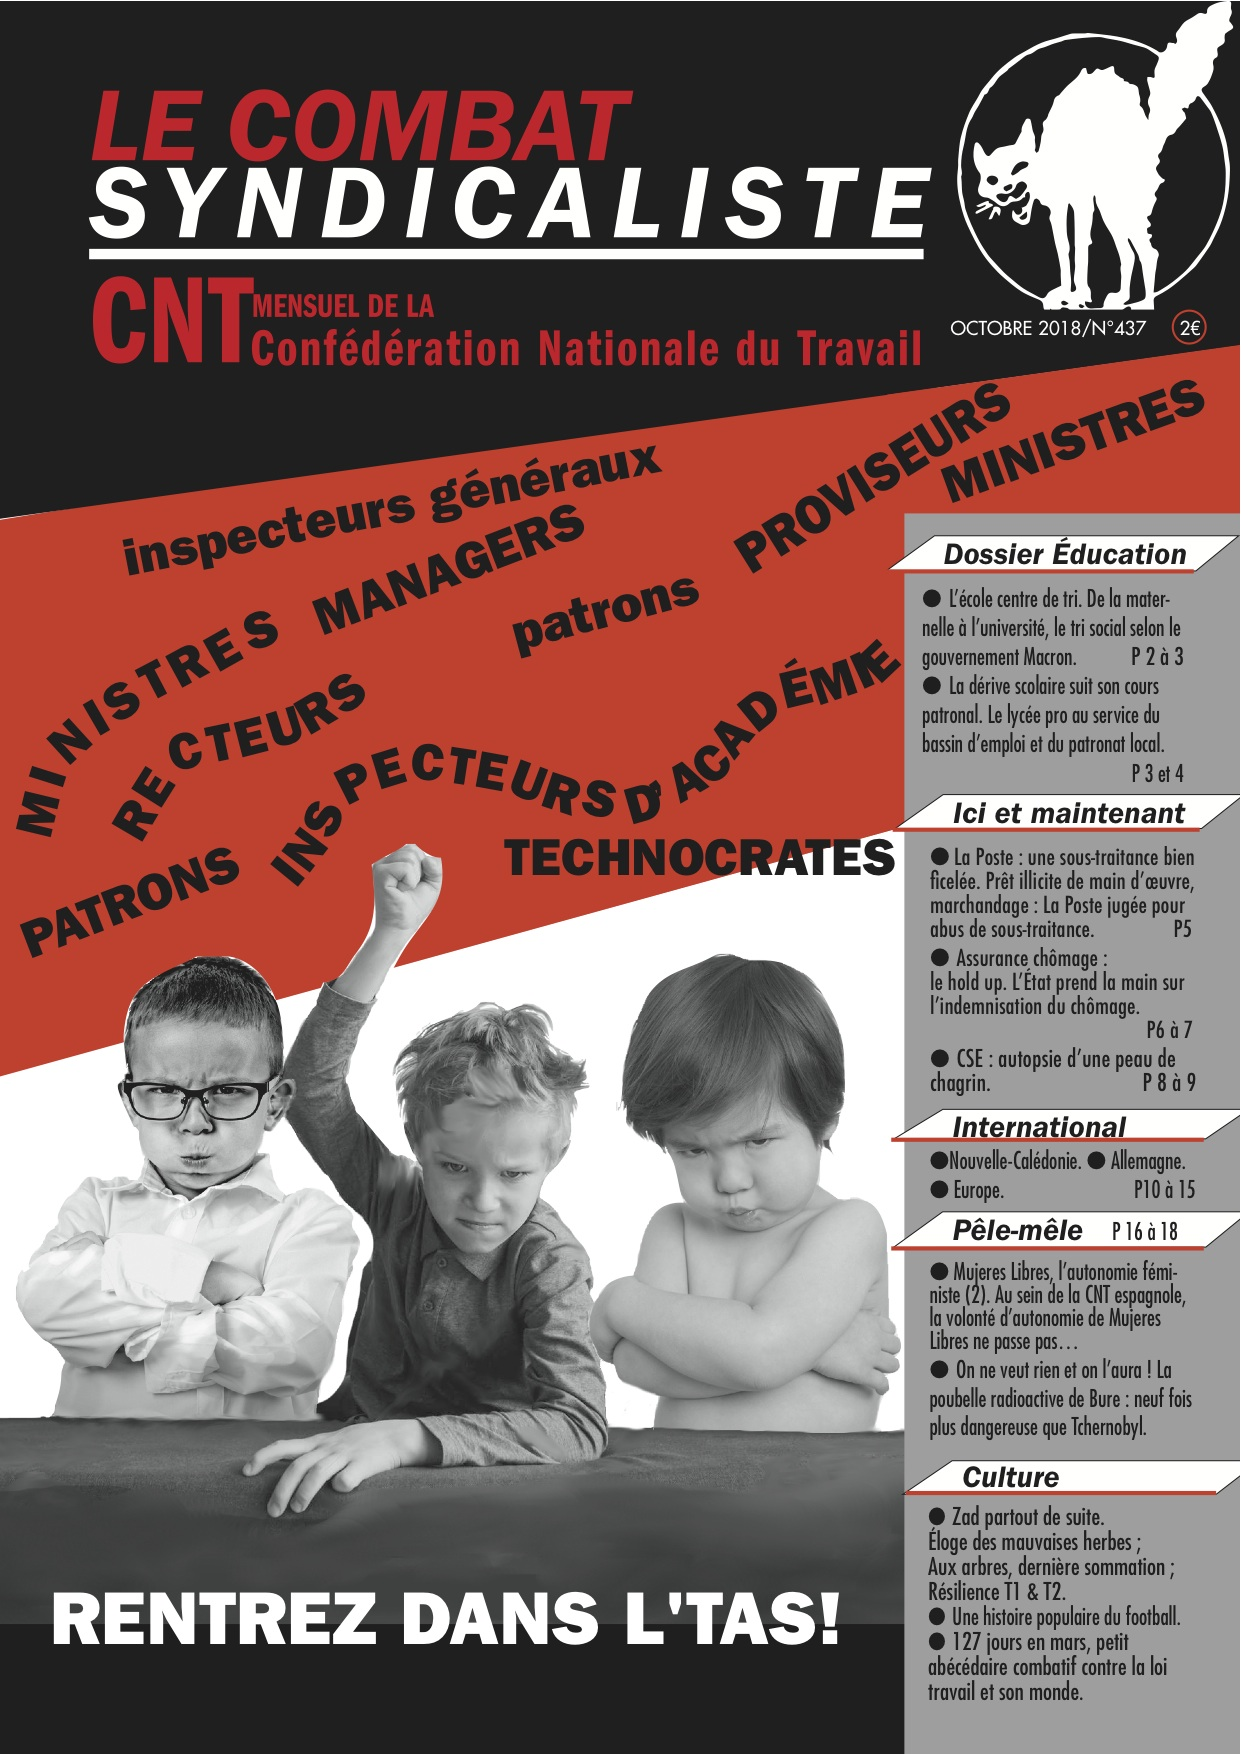 Combat Syndicaliste N 437 Octobre 2018 Confederation Nationale